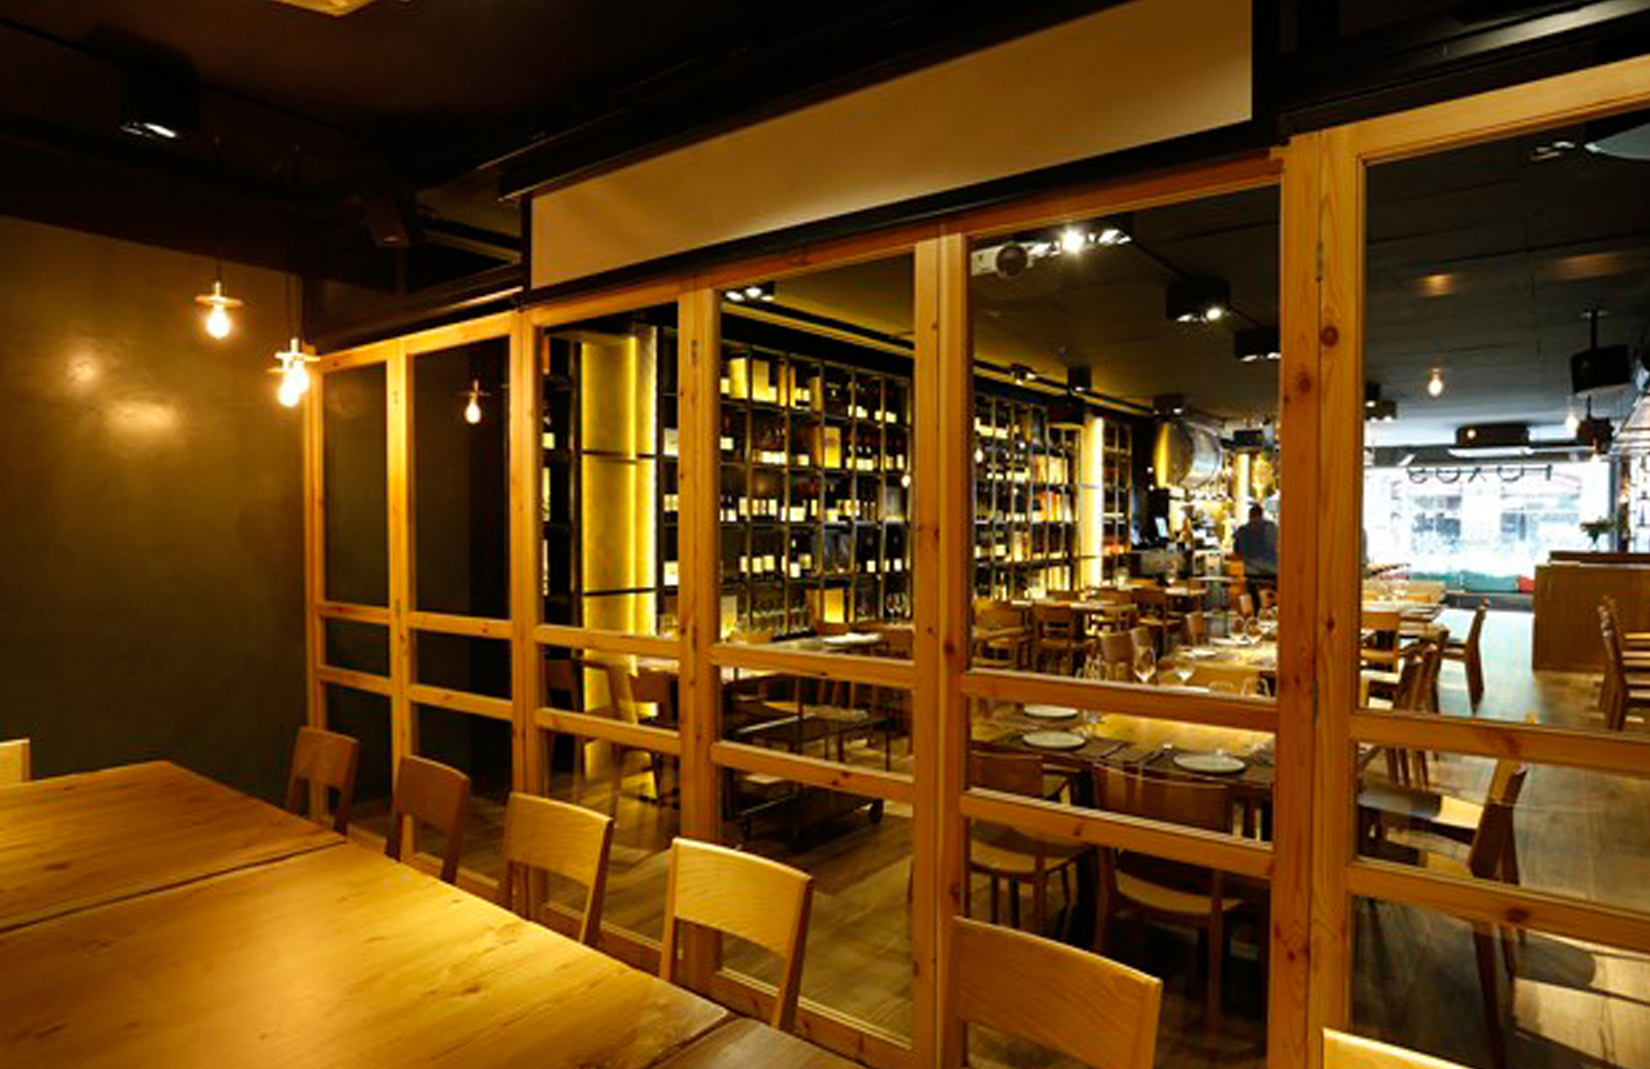 restaurante-salones-cocina-italiana-barcelona